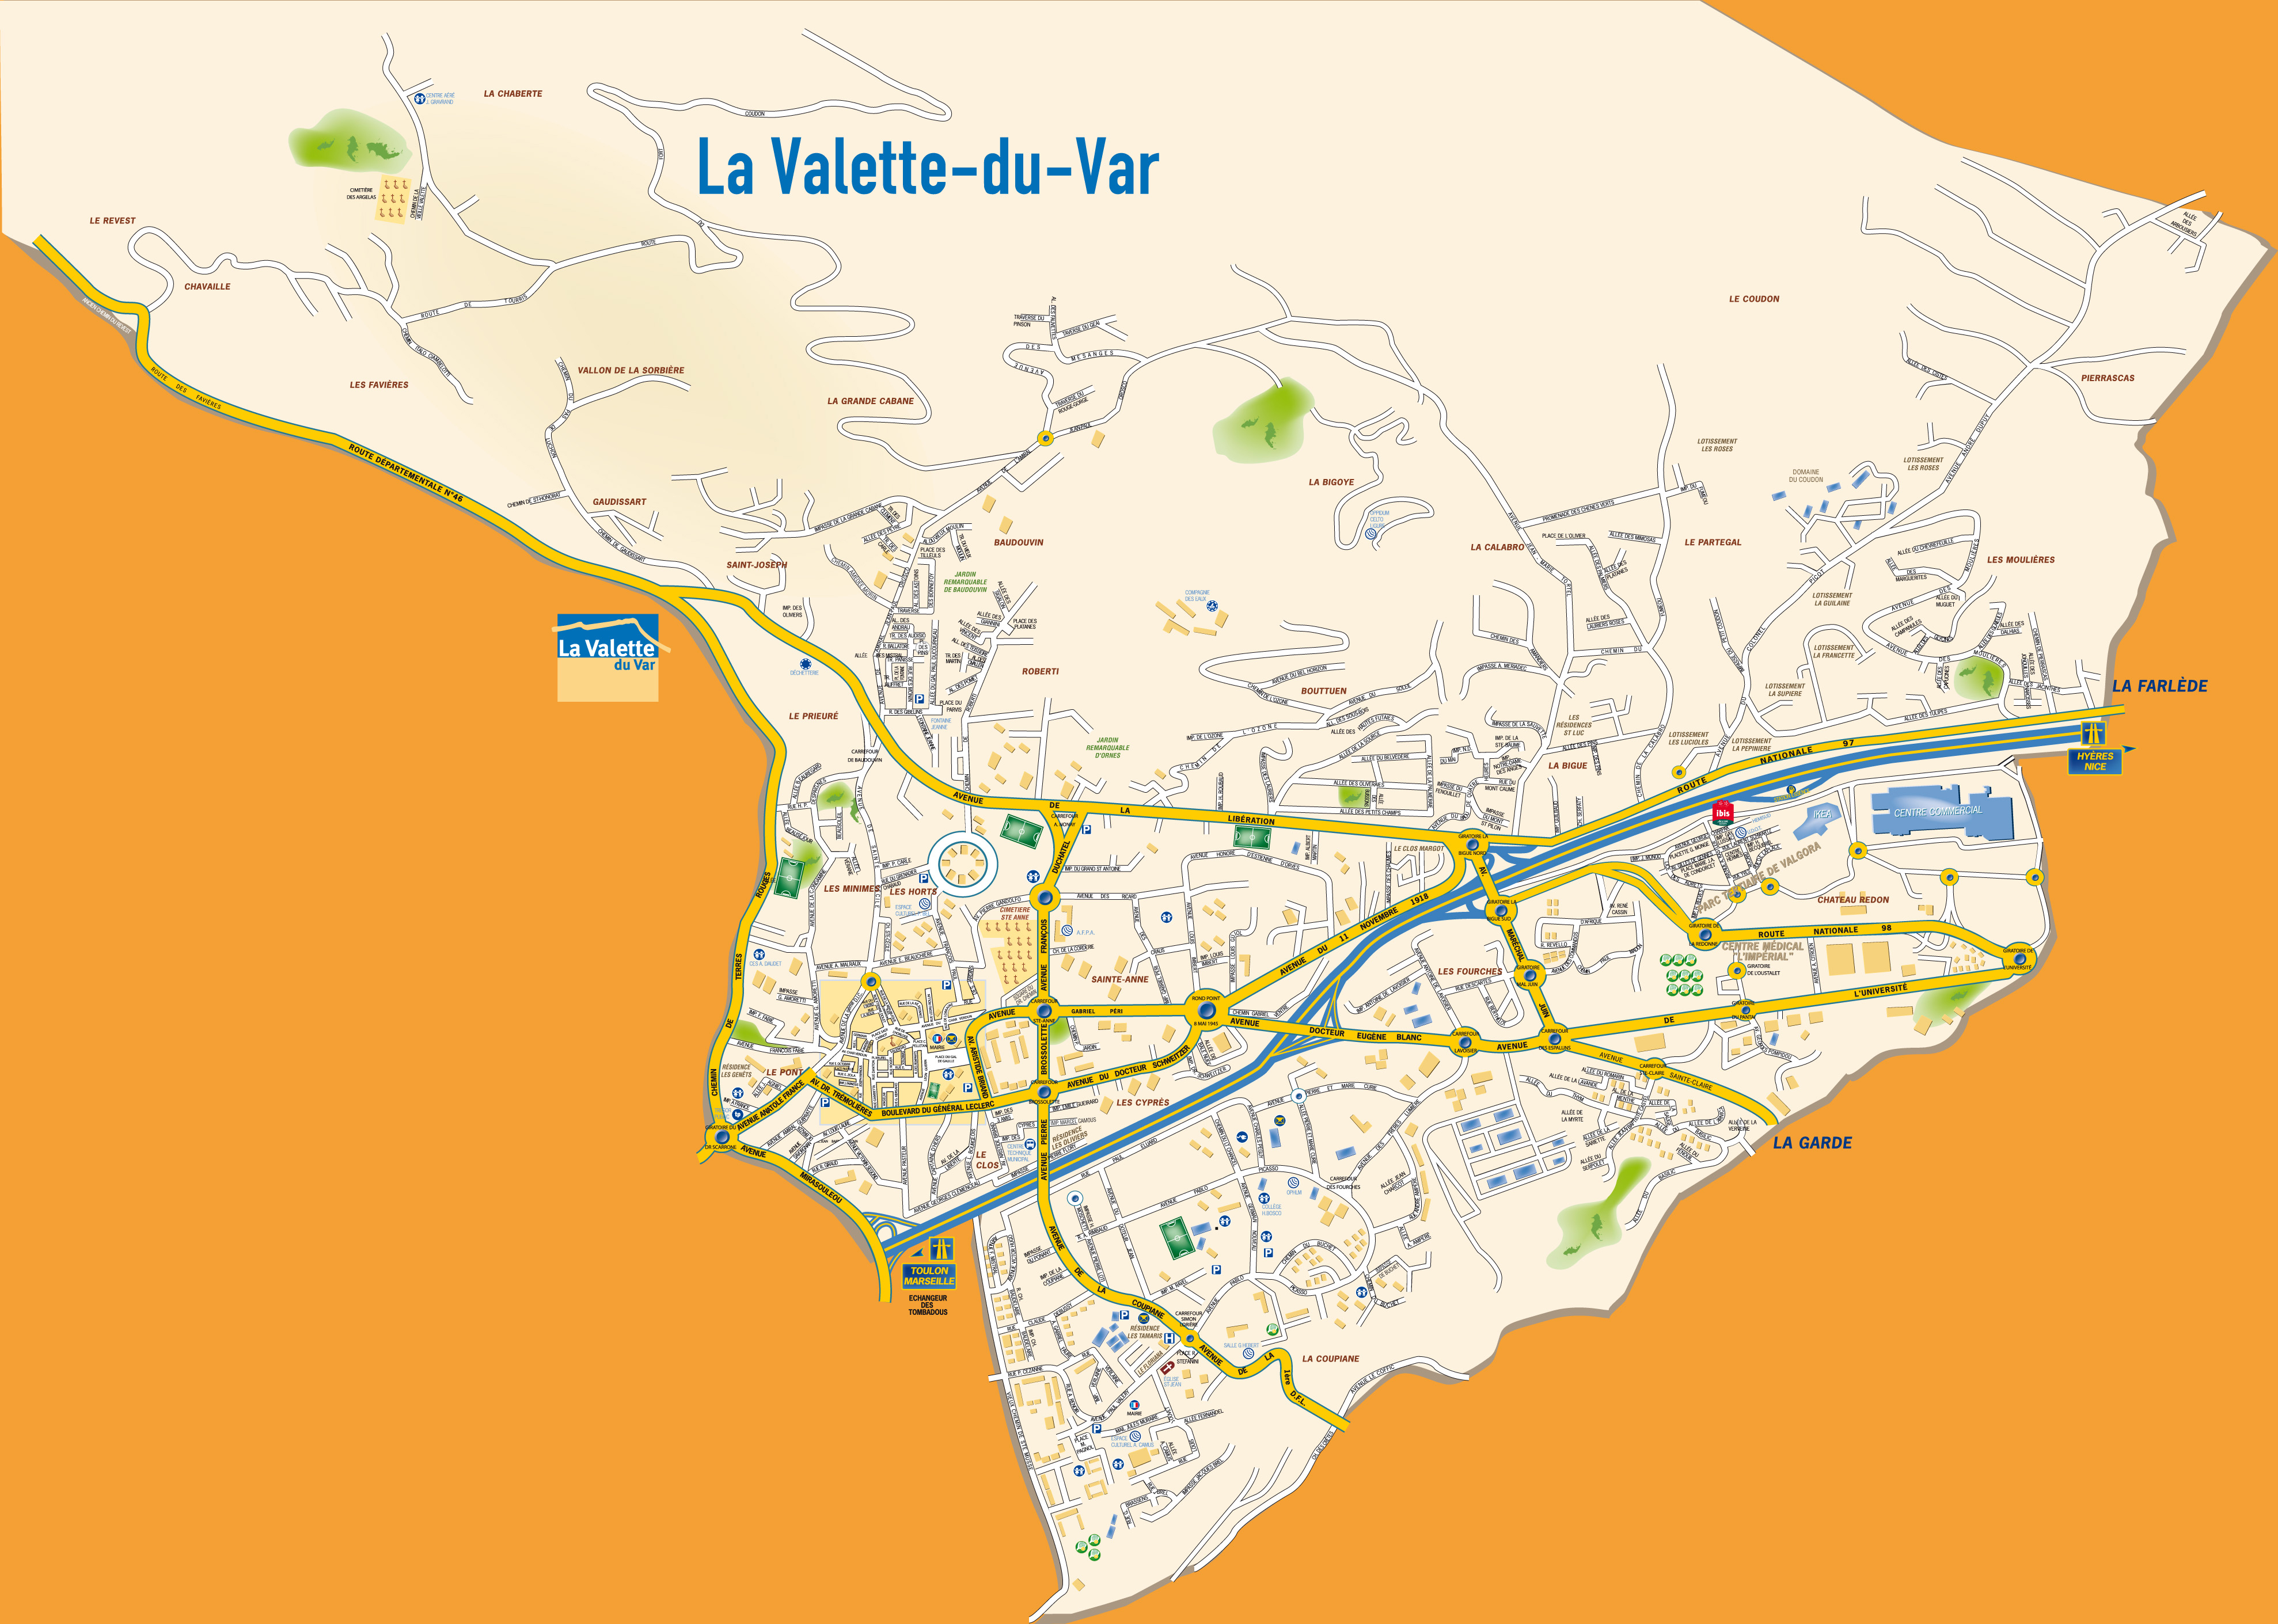 Carte de la Valette